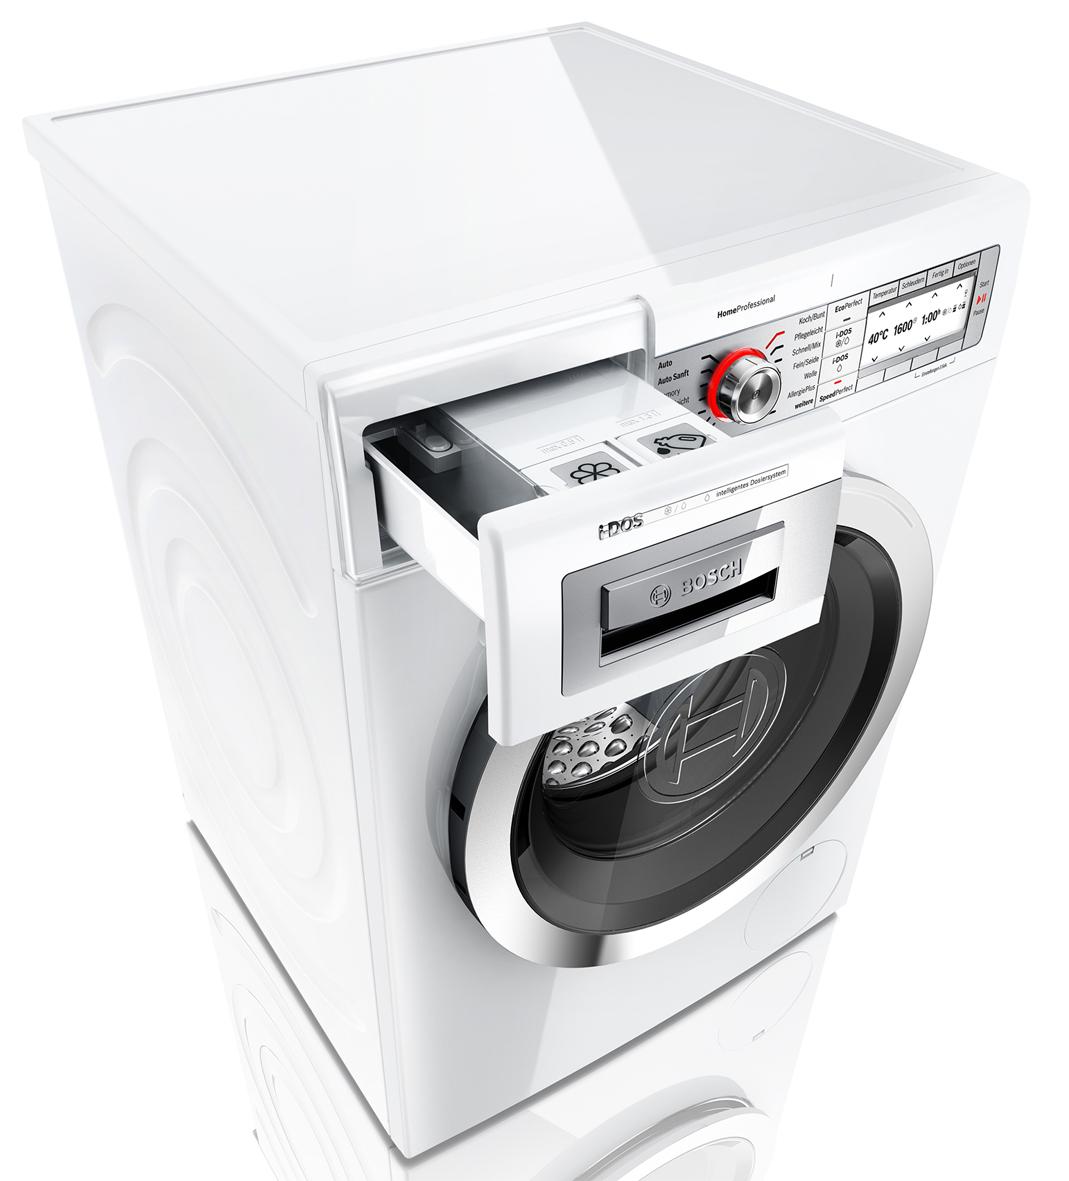 bosch homeprofessional i dos waschmaschine mit. Black Bedroom Furniture Sets. Home Design Ideas